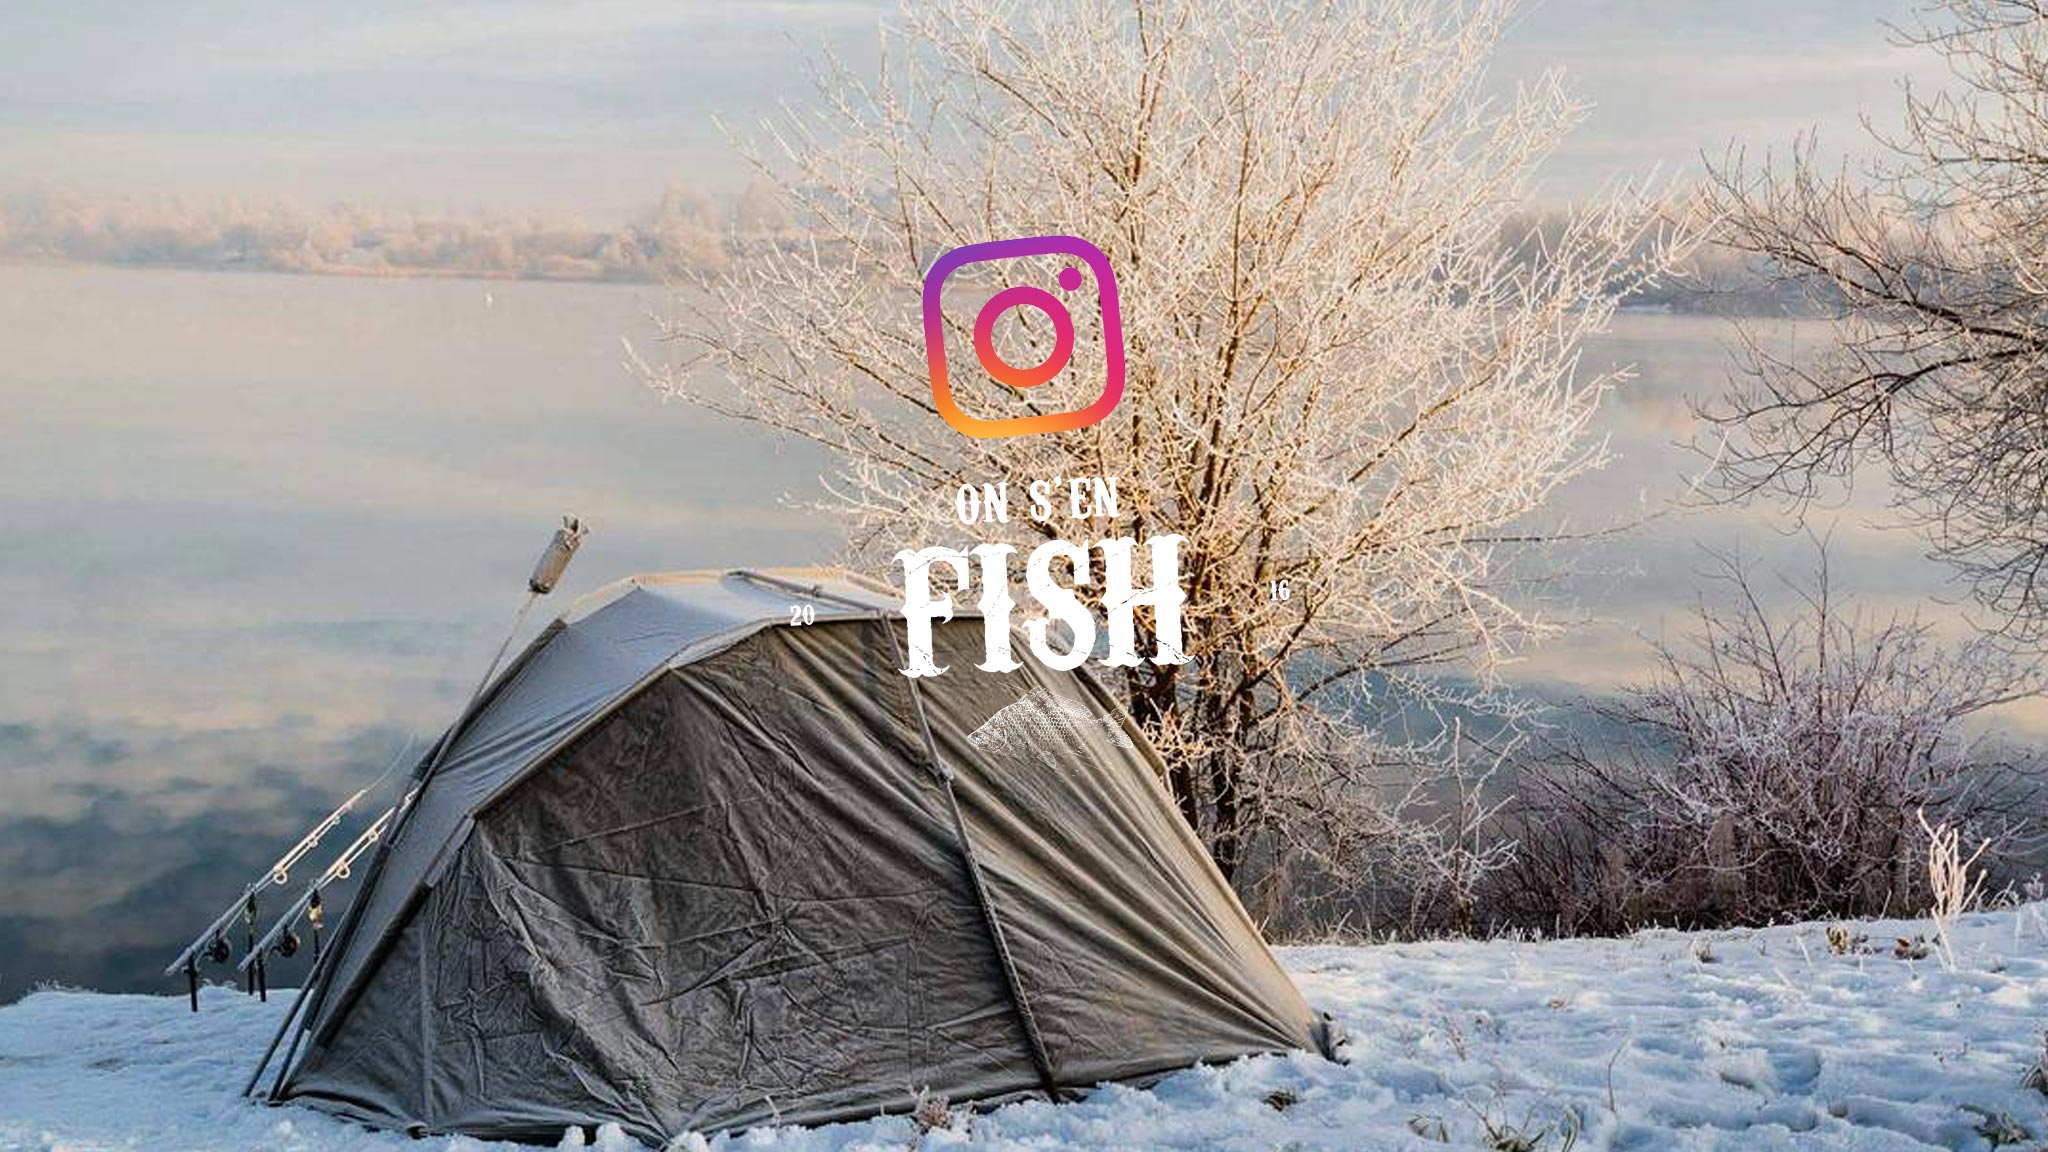 on-s-en-fish-header-article-carpstagram-best-of-peche-carpe-instagram-21